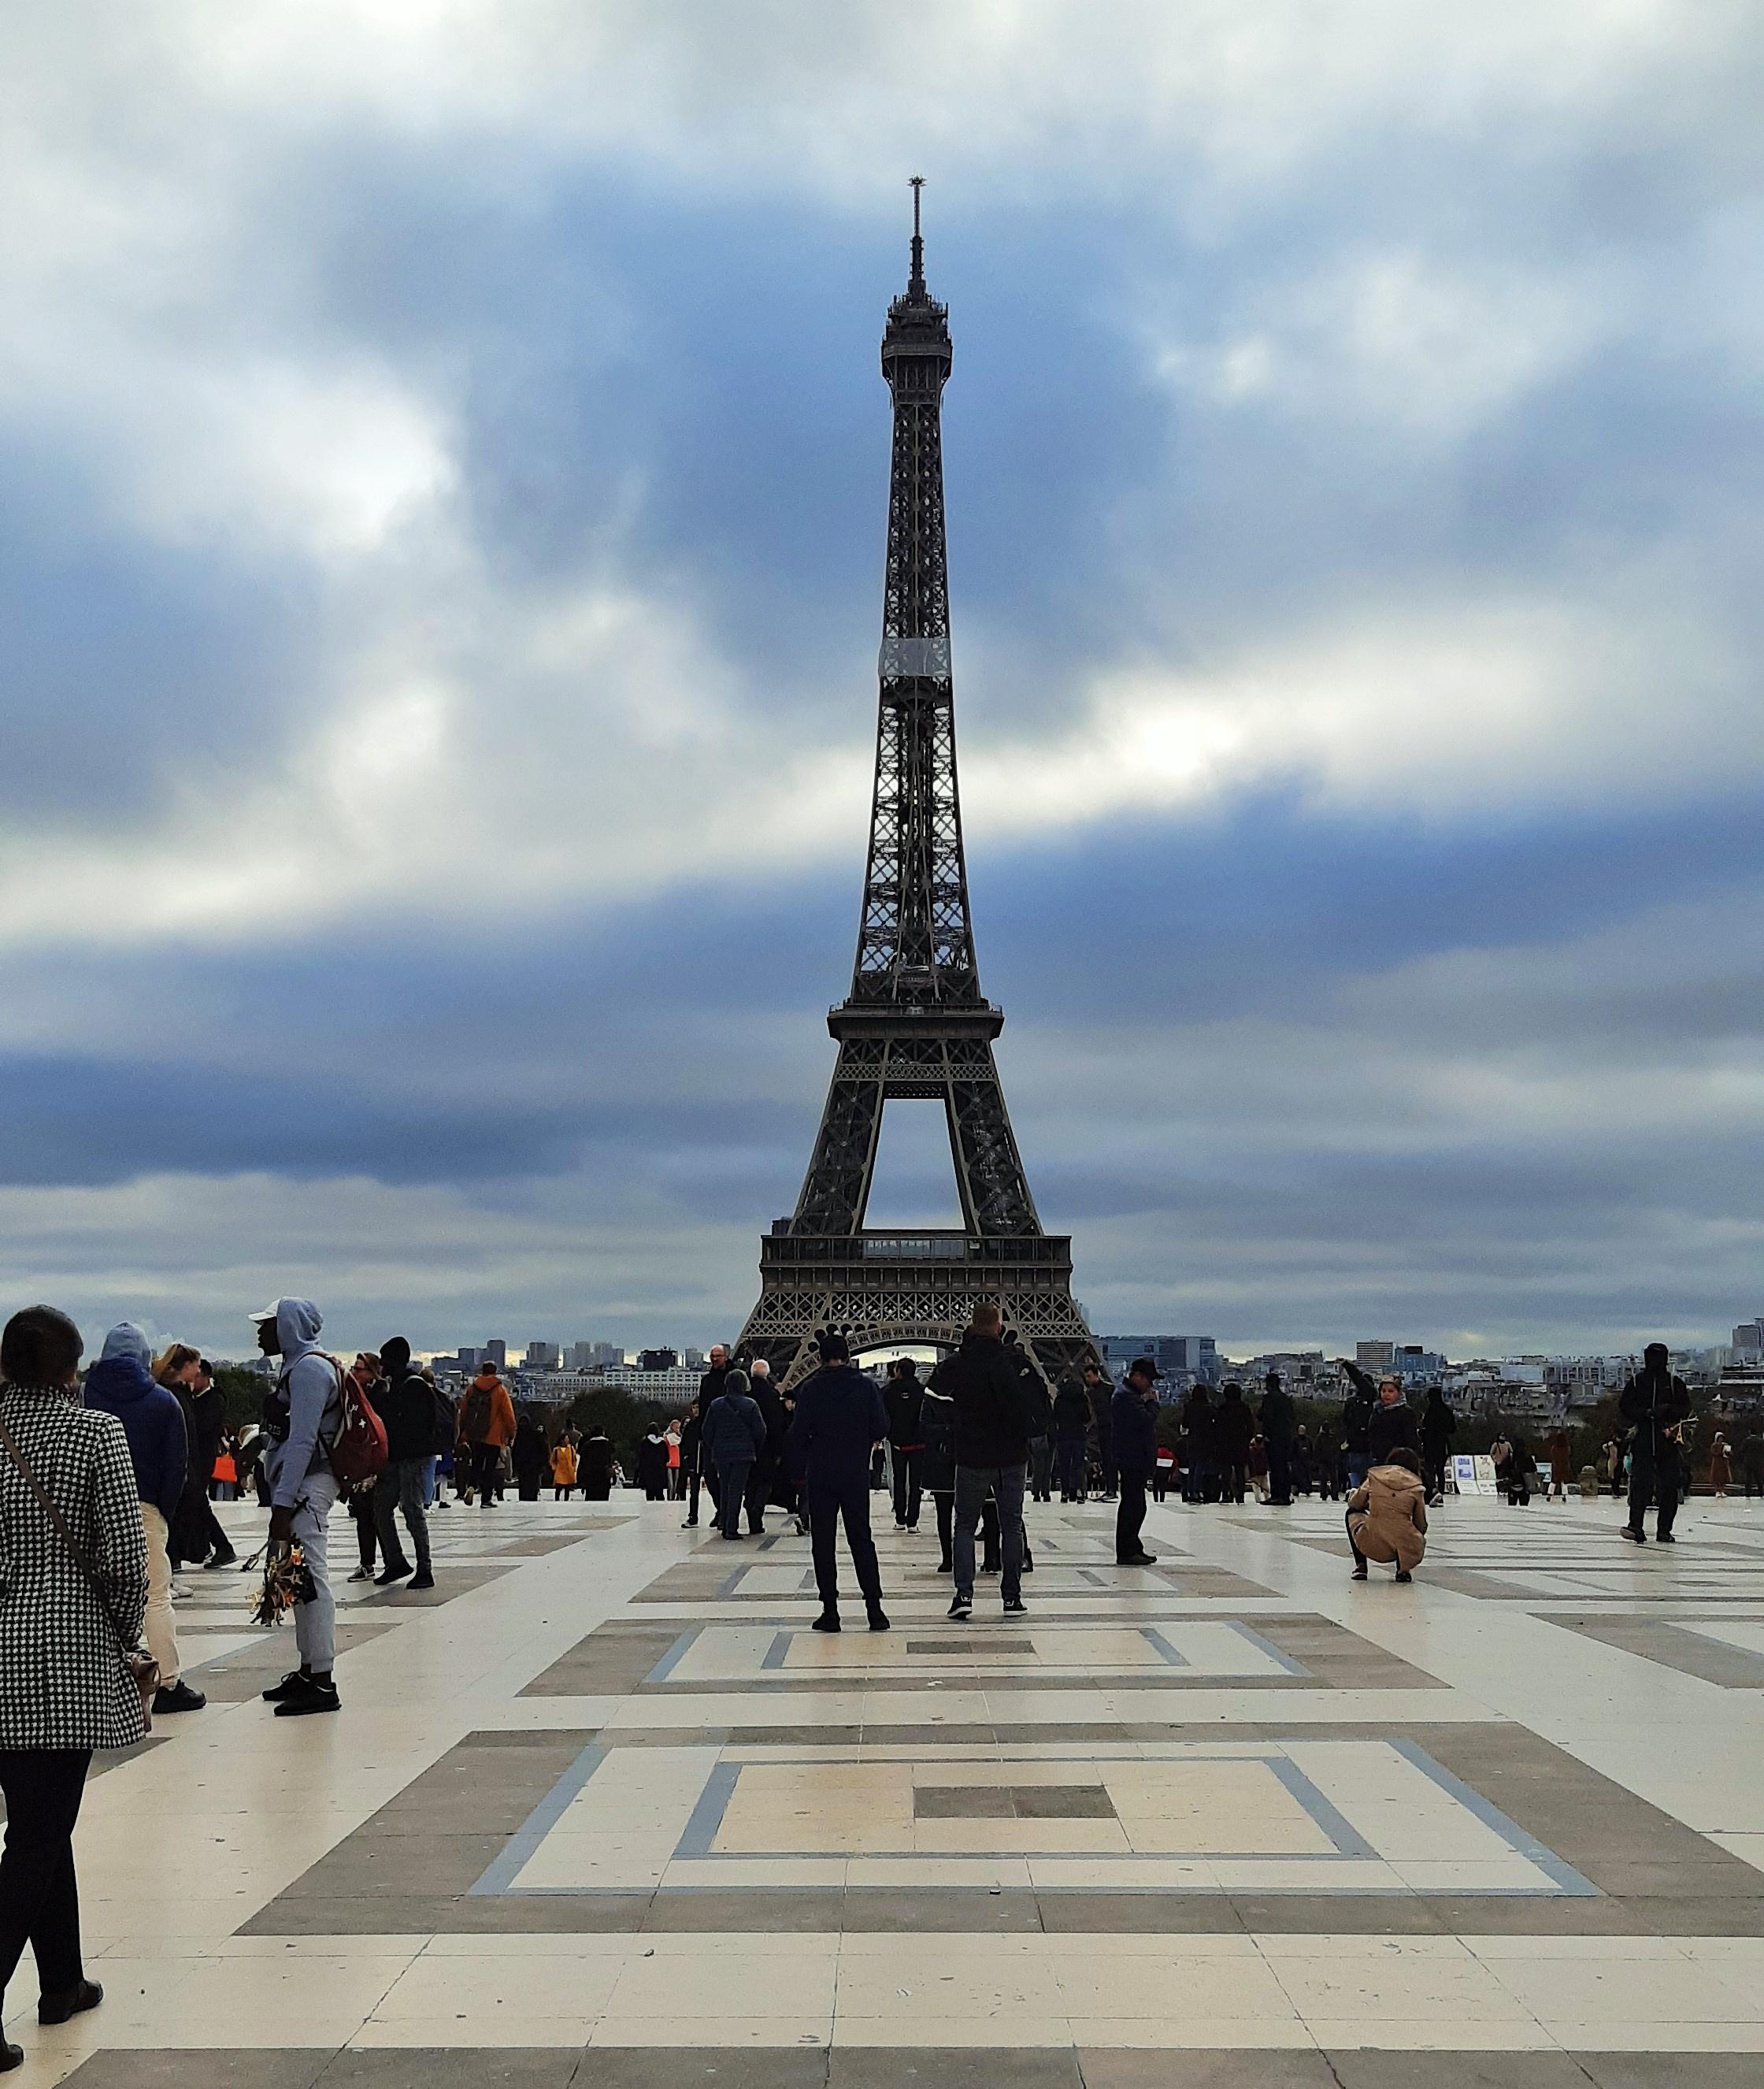 https://0901.nccdn.net/4_2/000/000/008/486/Trocadero---2-2240x2652.jpg